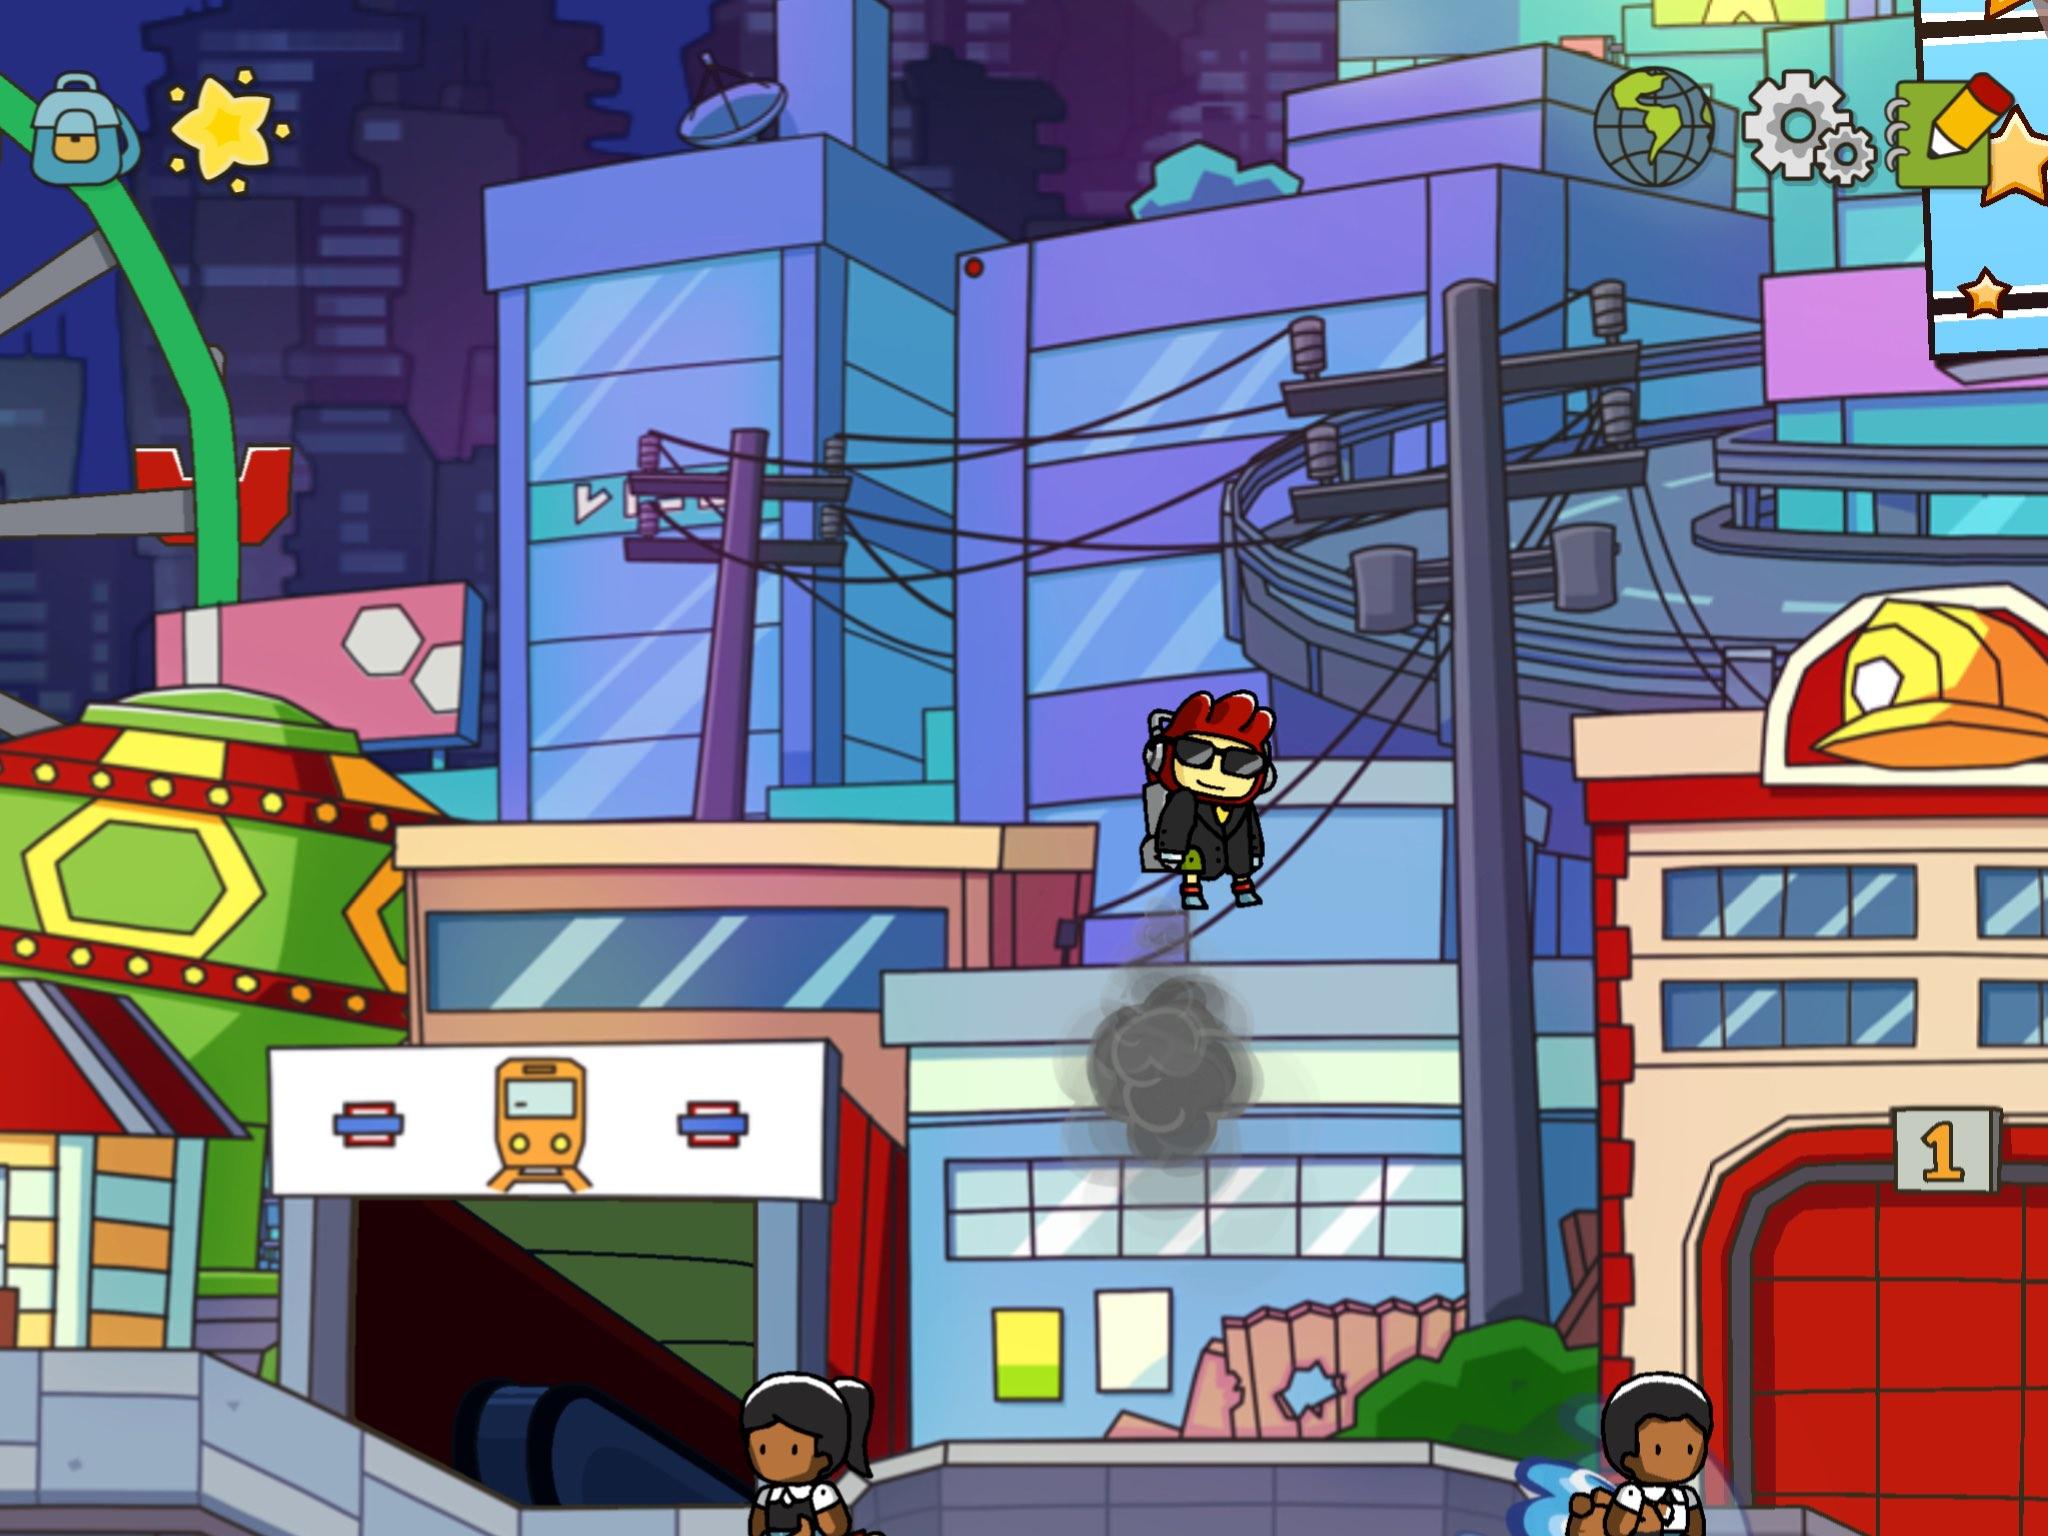 Scribblenauts Unlimited' Review – Scribblenauts Reloaded